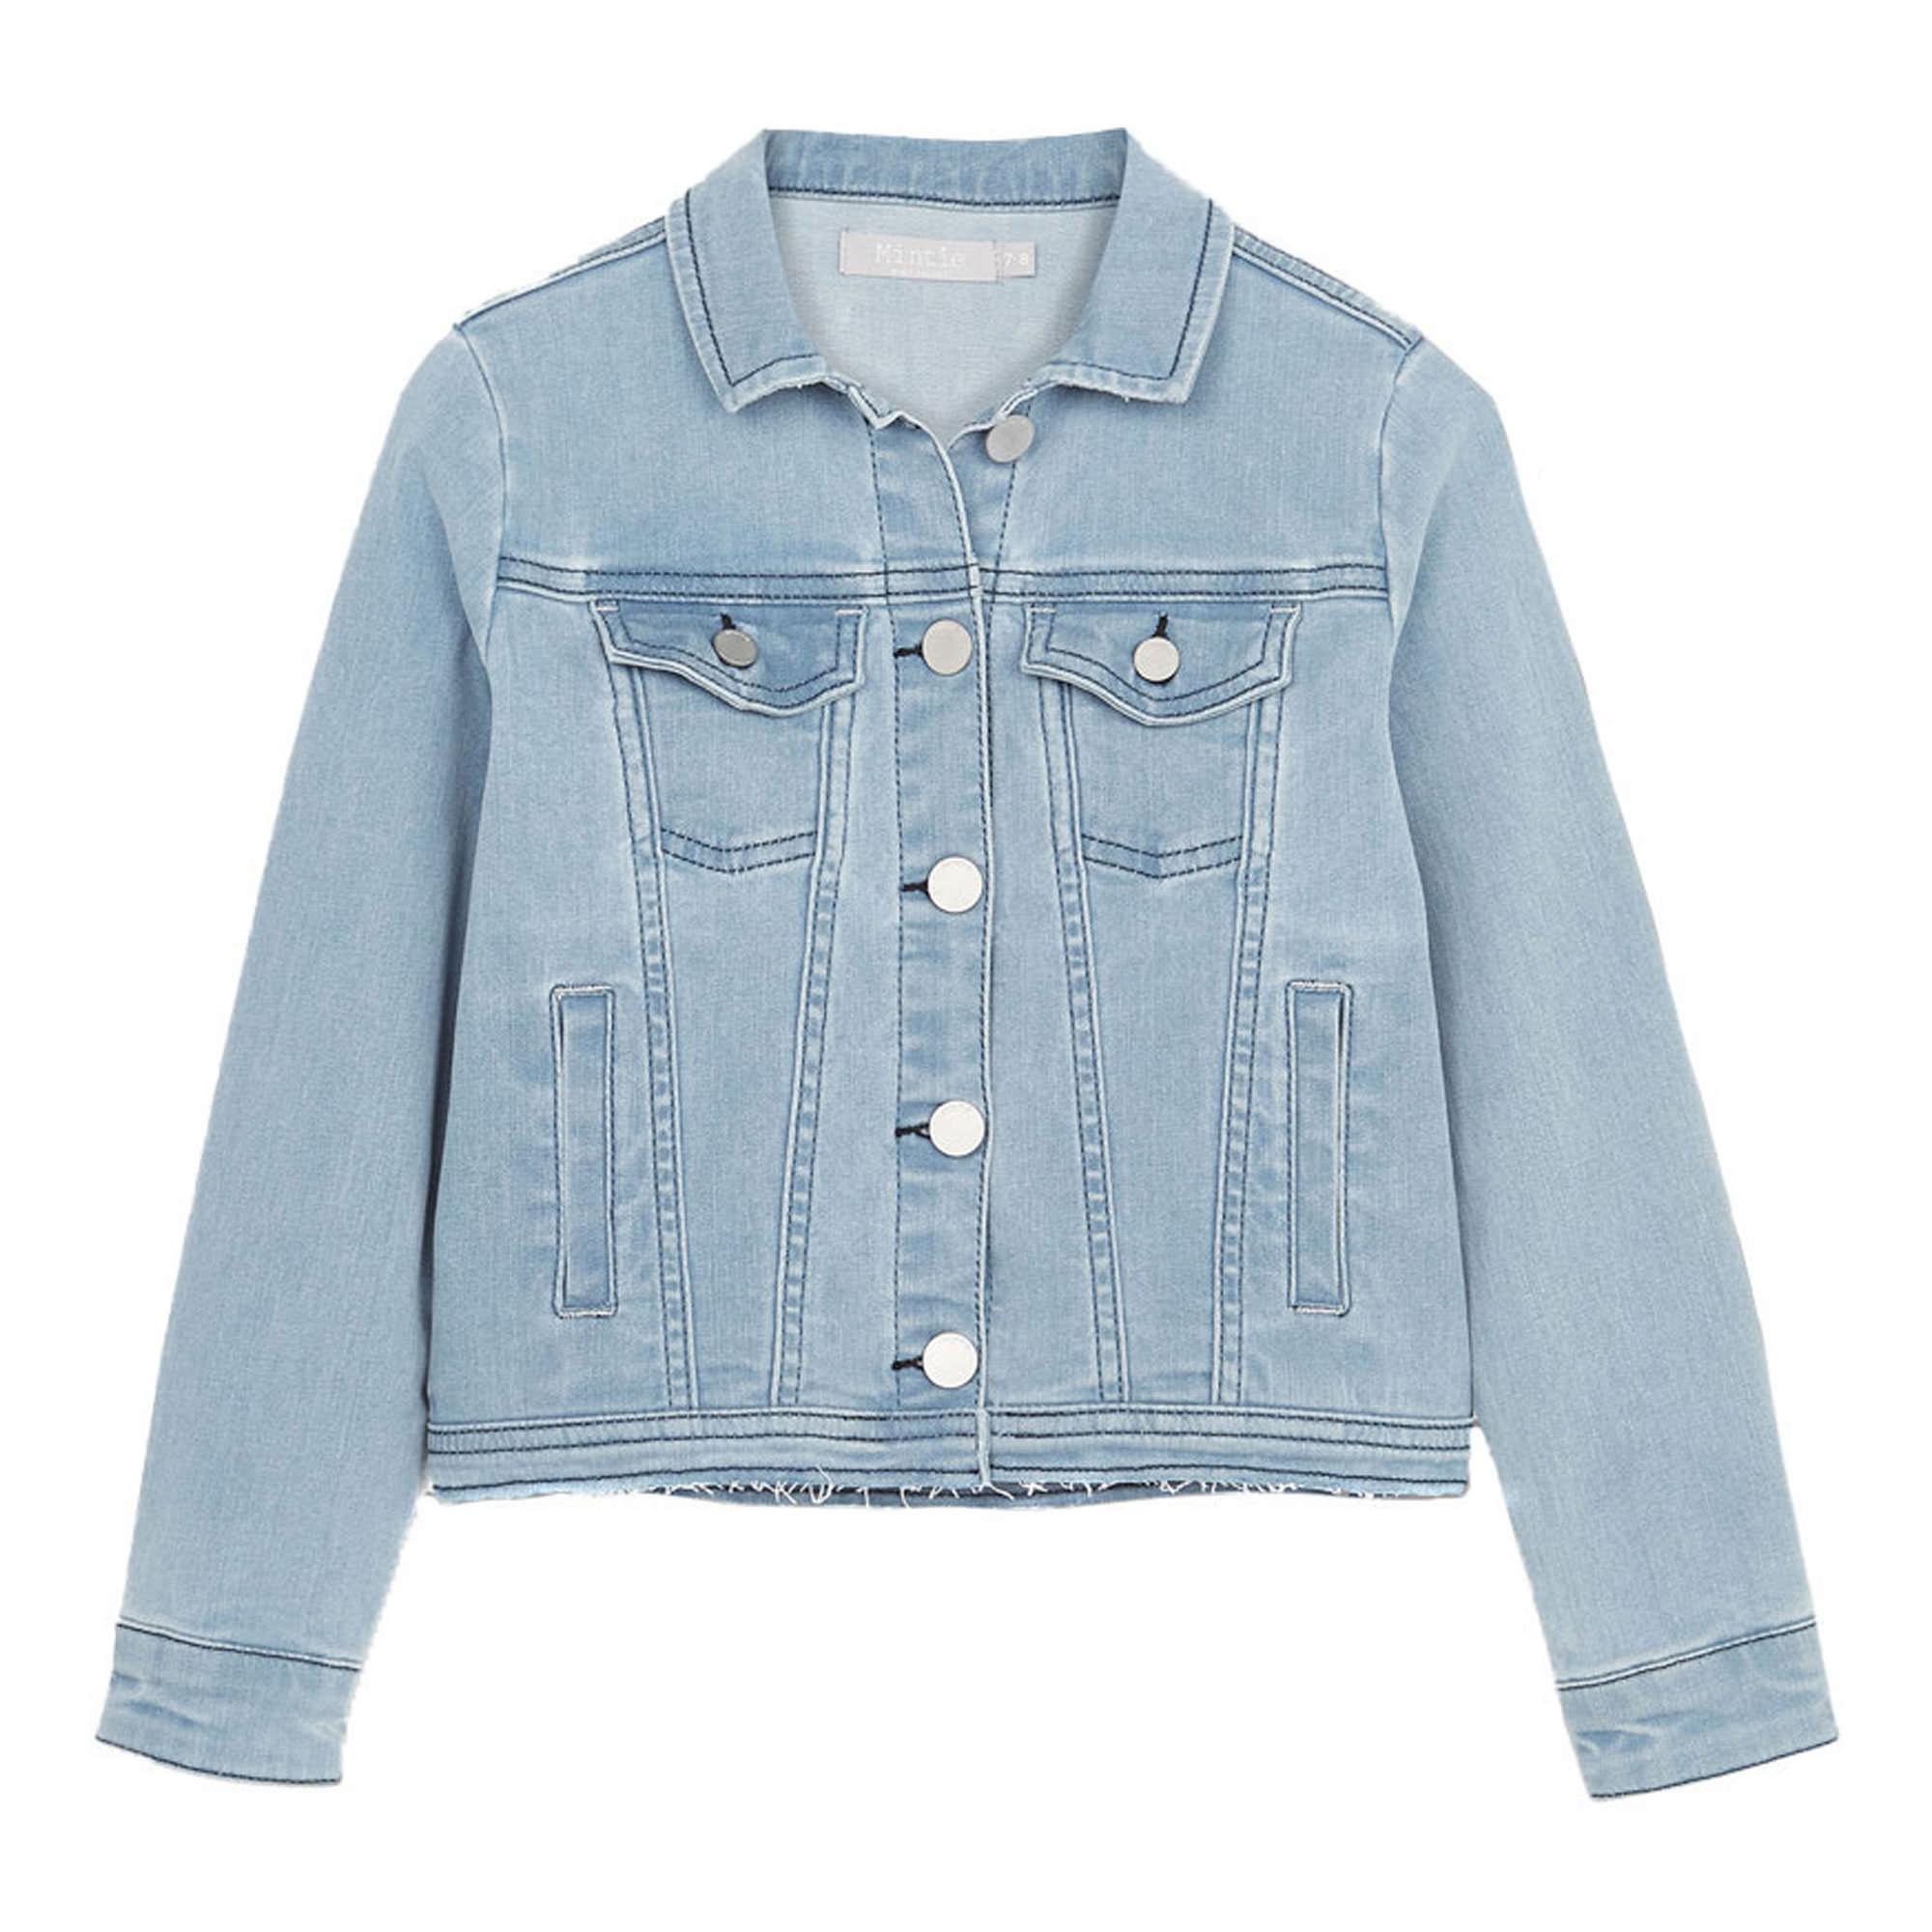 Washed Blue Denim Jacket